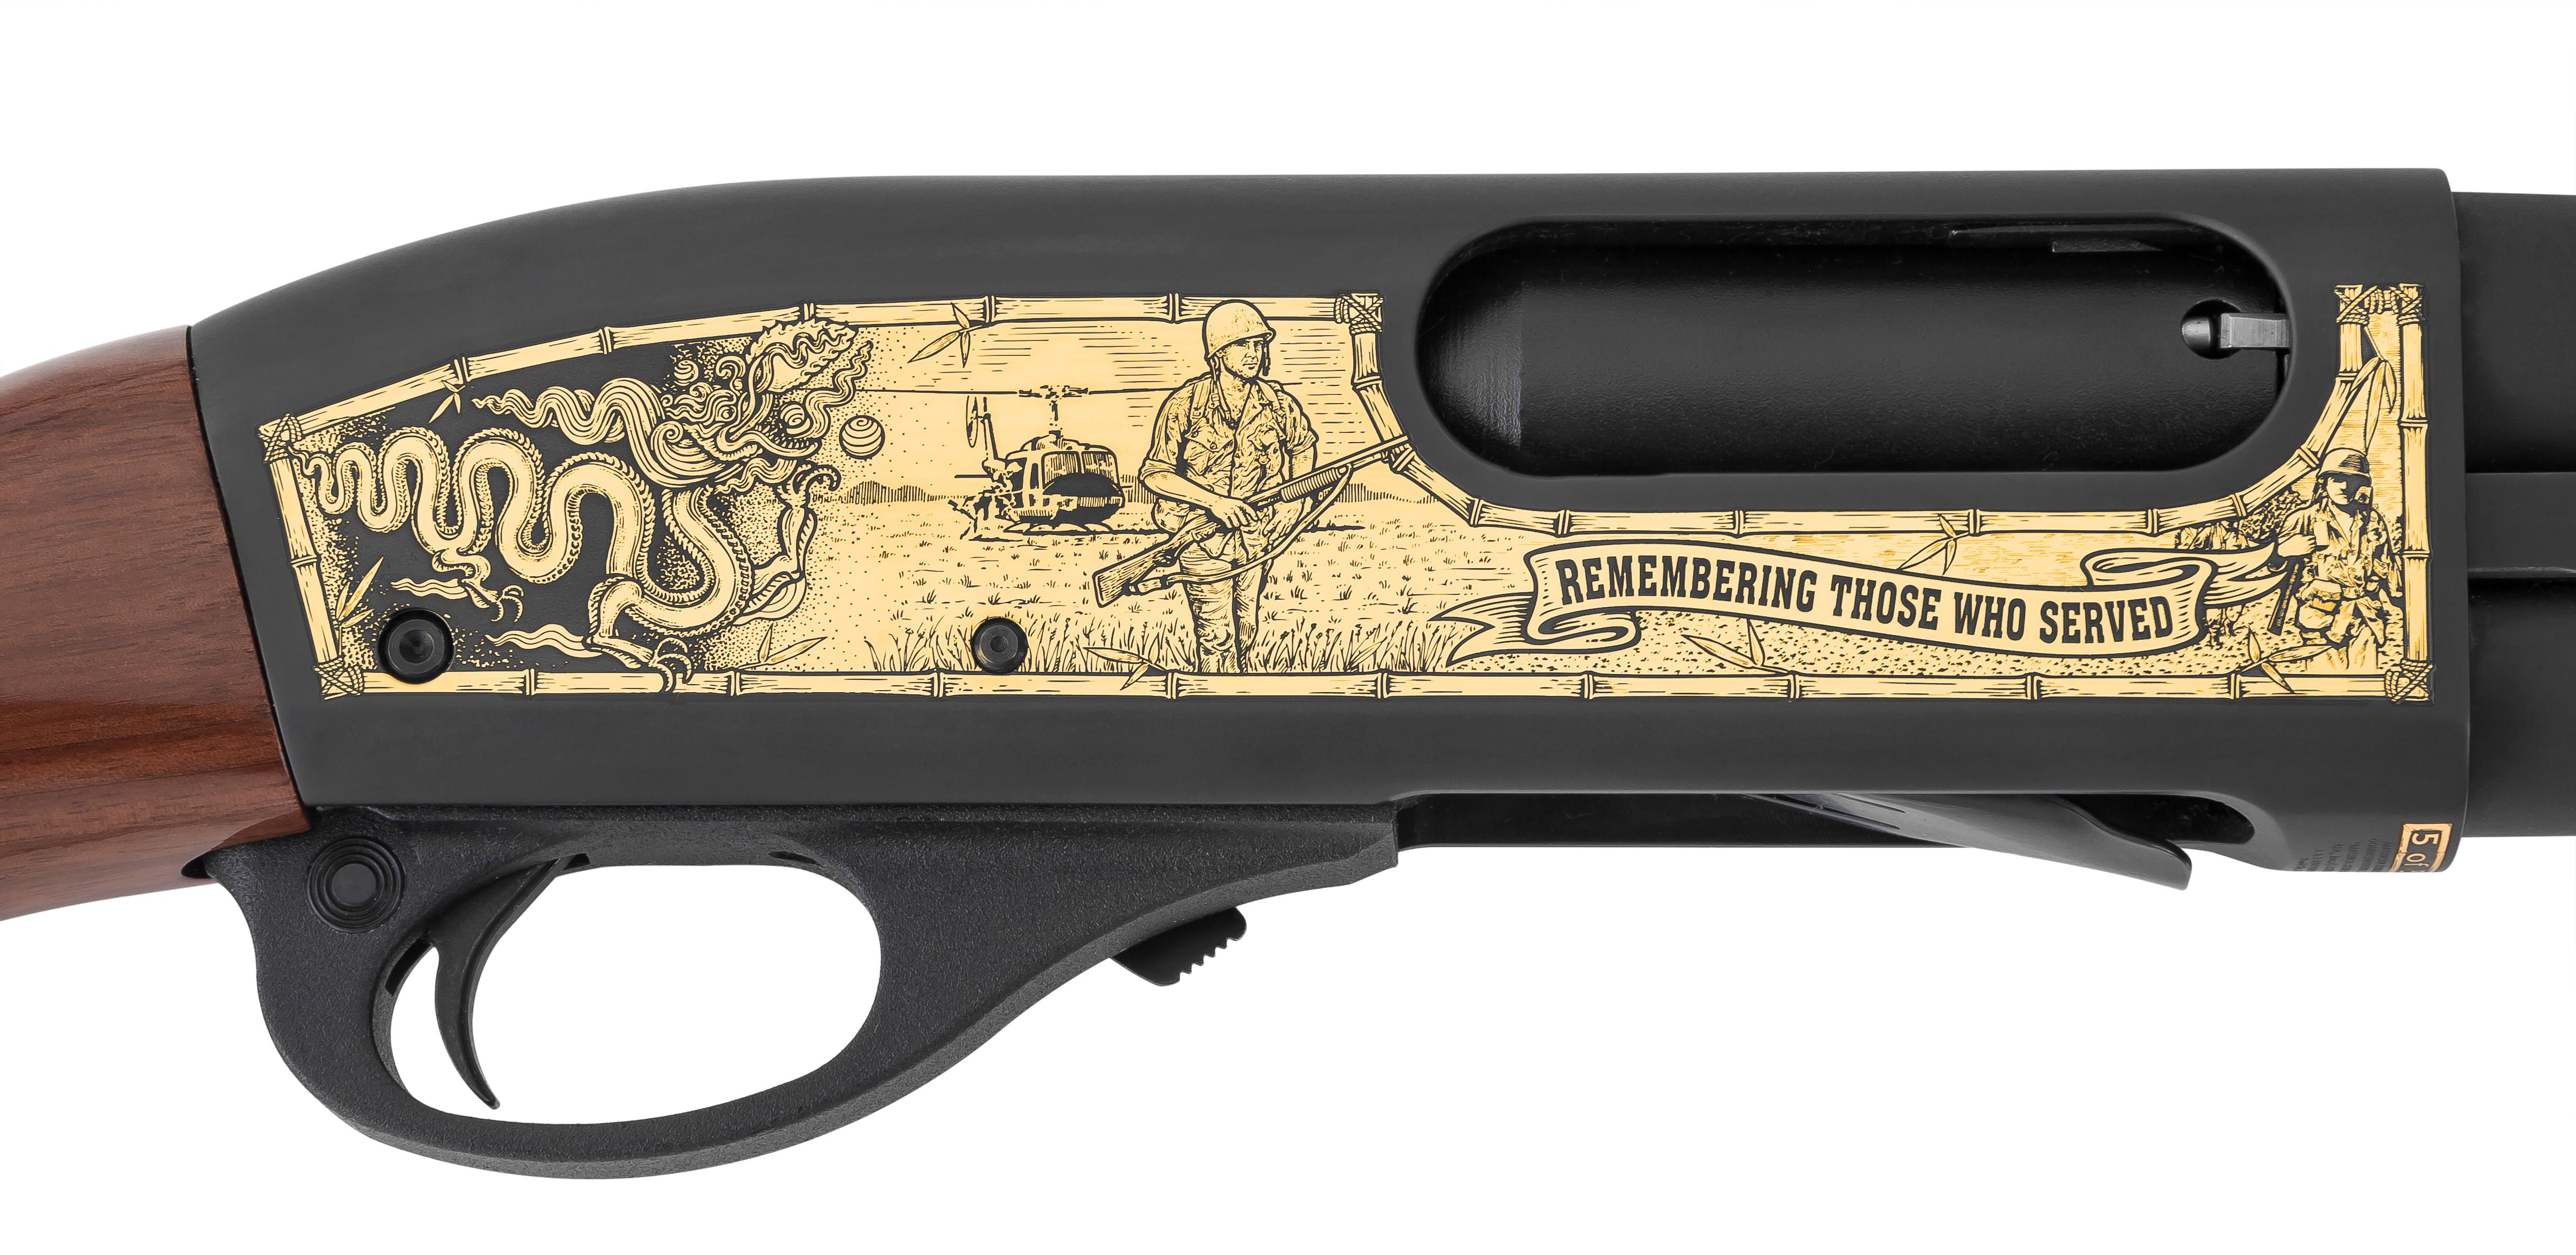 Remington Shotgun Wallpaper 870 Tactical Hunting Fotos 1187 Diagram Http Www Gun Parts Com Remingtonshotgun Download